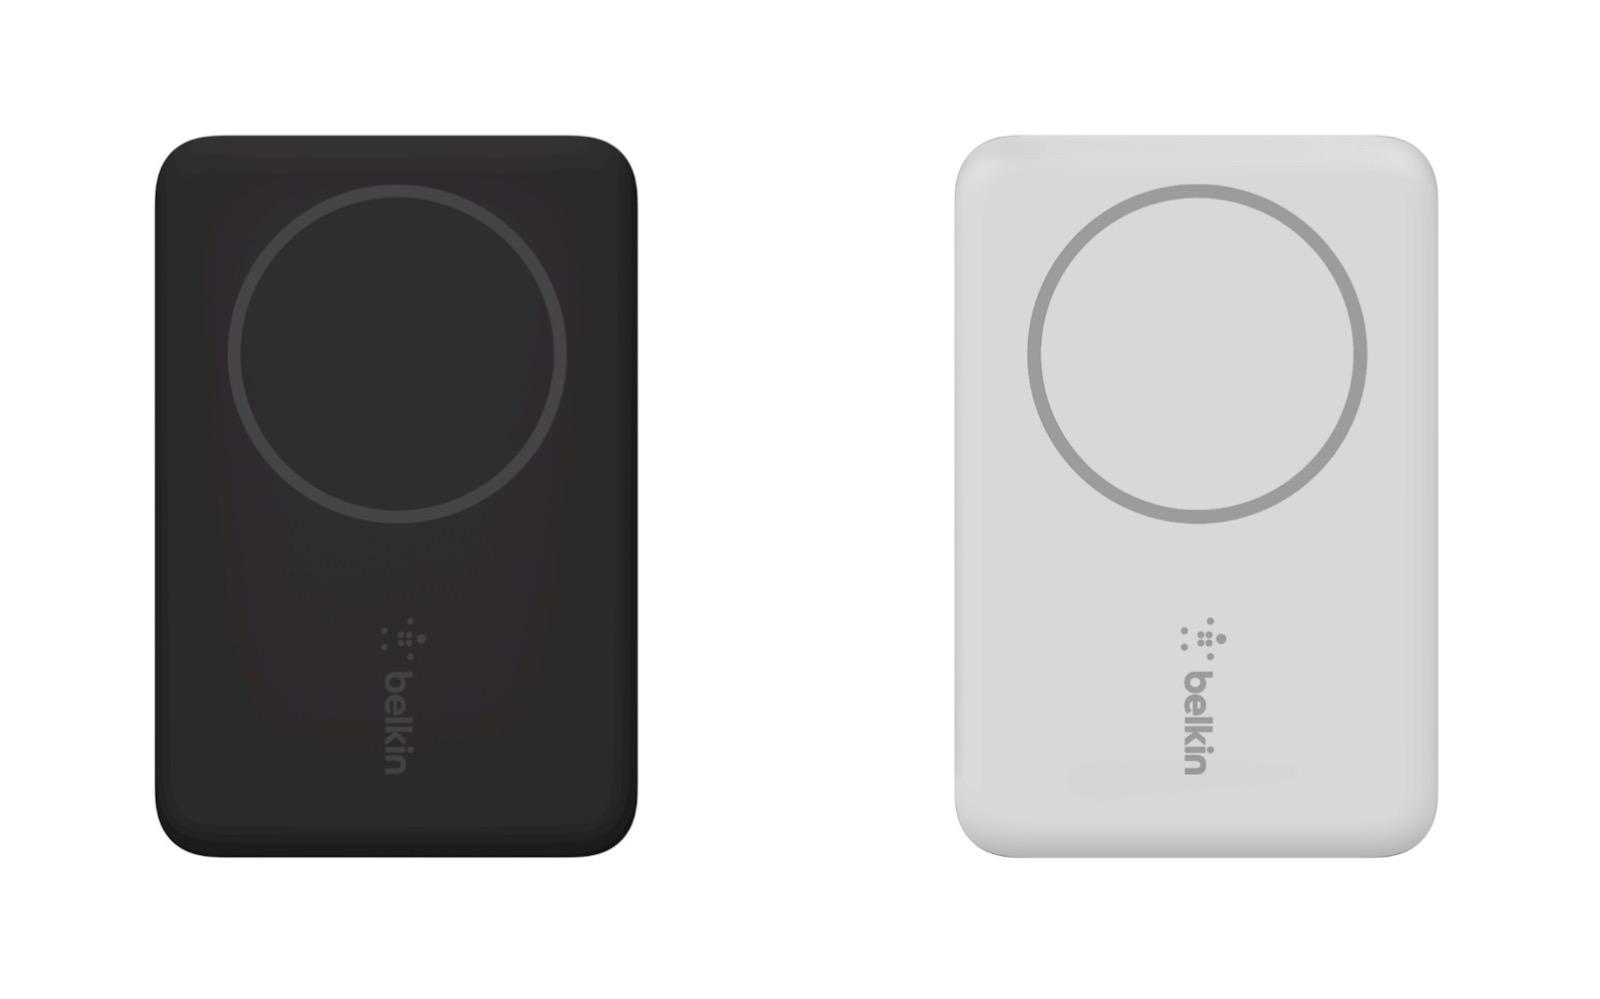 Belkin-MagSafe-Mobile-battery-2.jpg